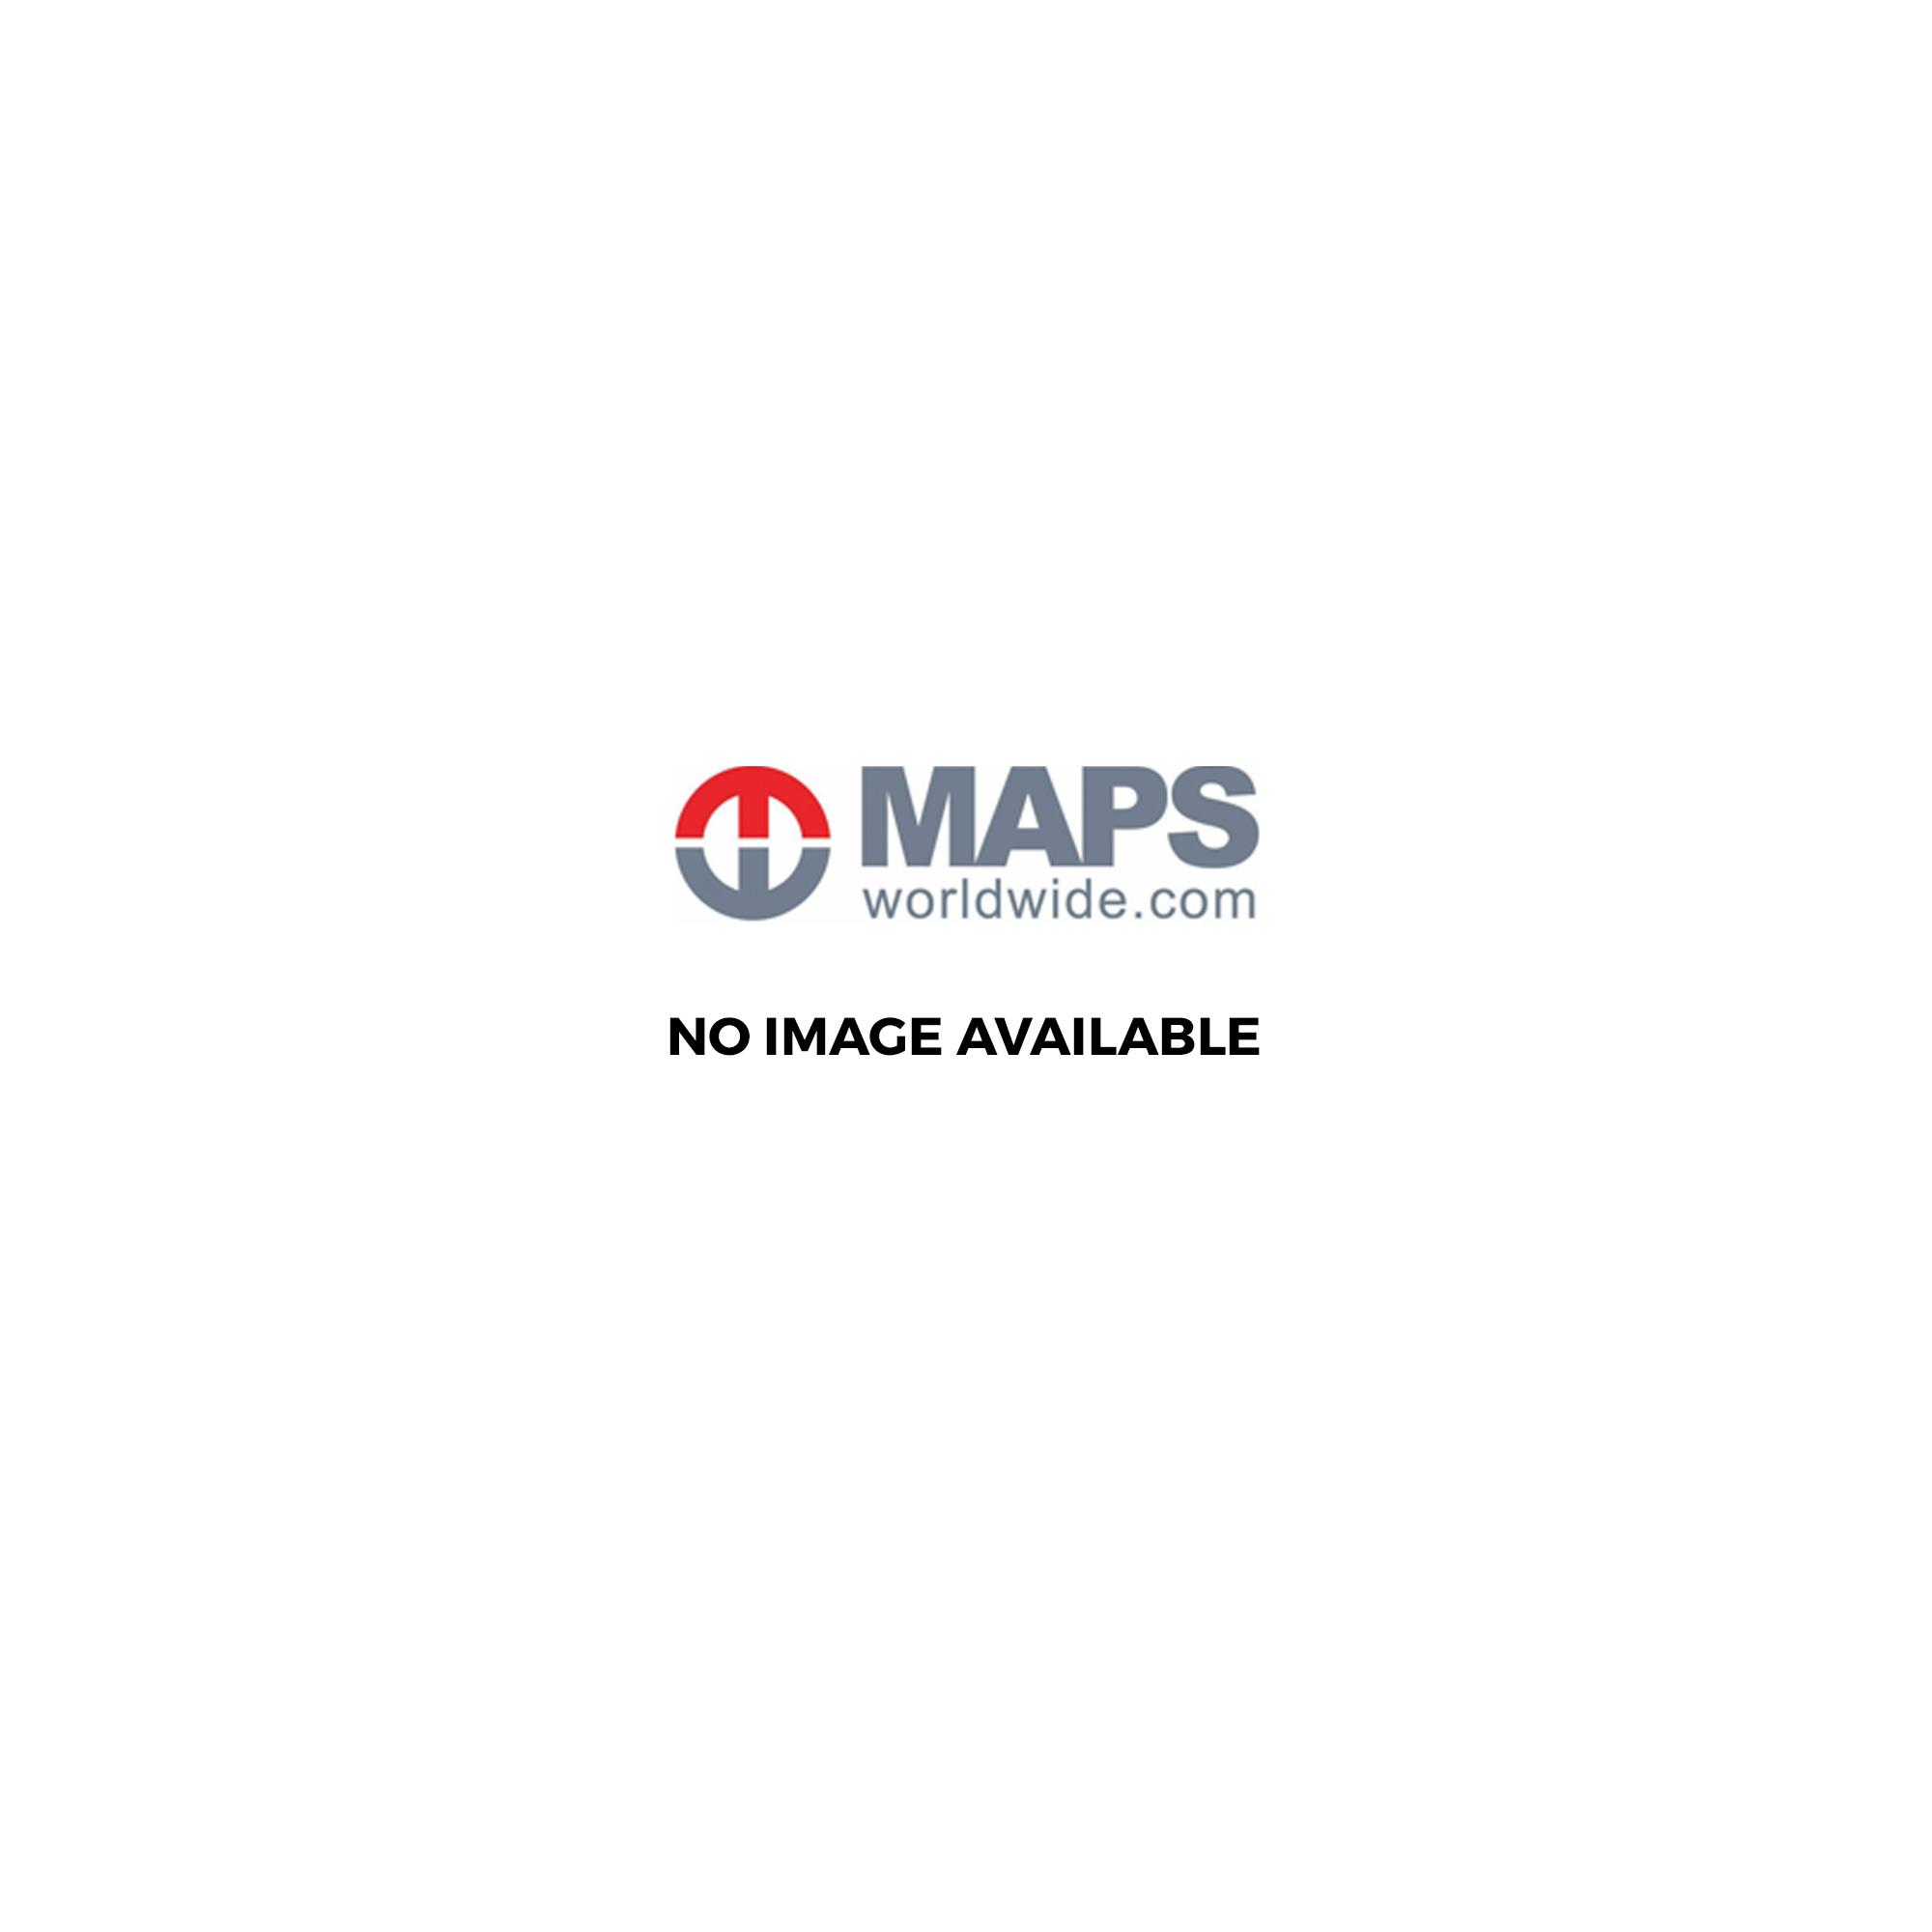 Hallwag Hiking tour map 8: Lugano Region / Mendrisiotto published by ...